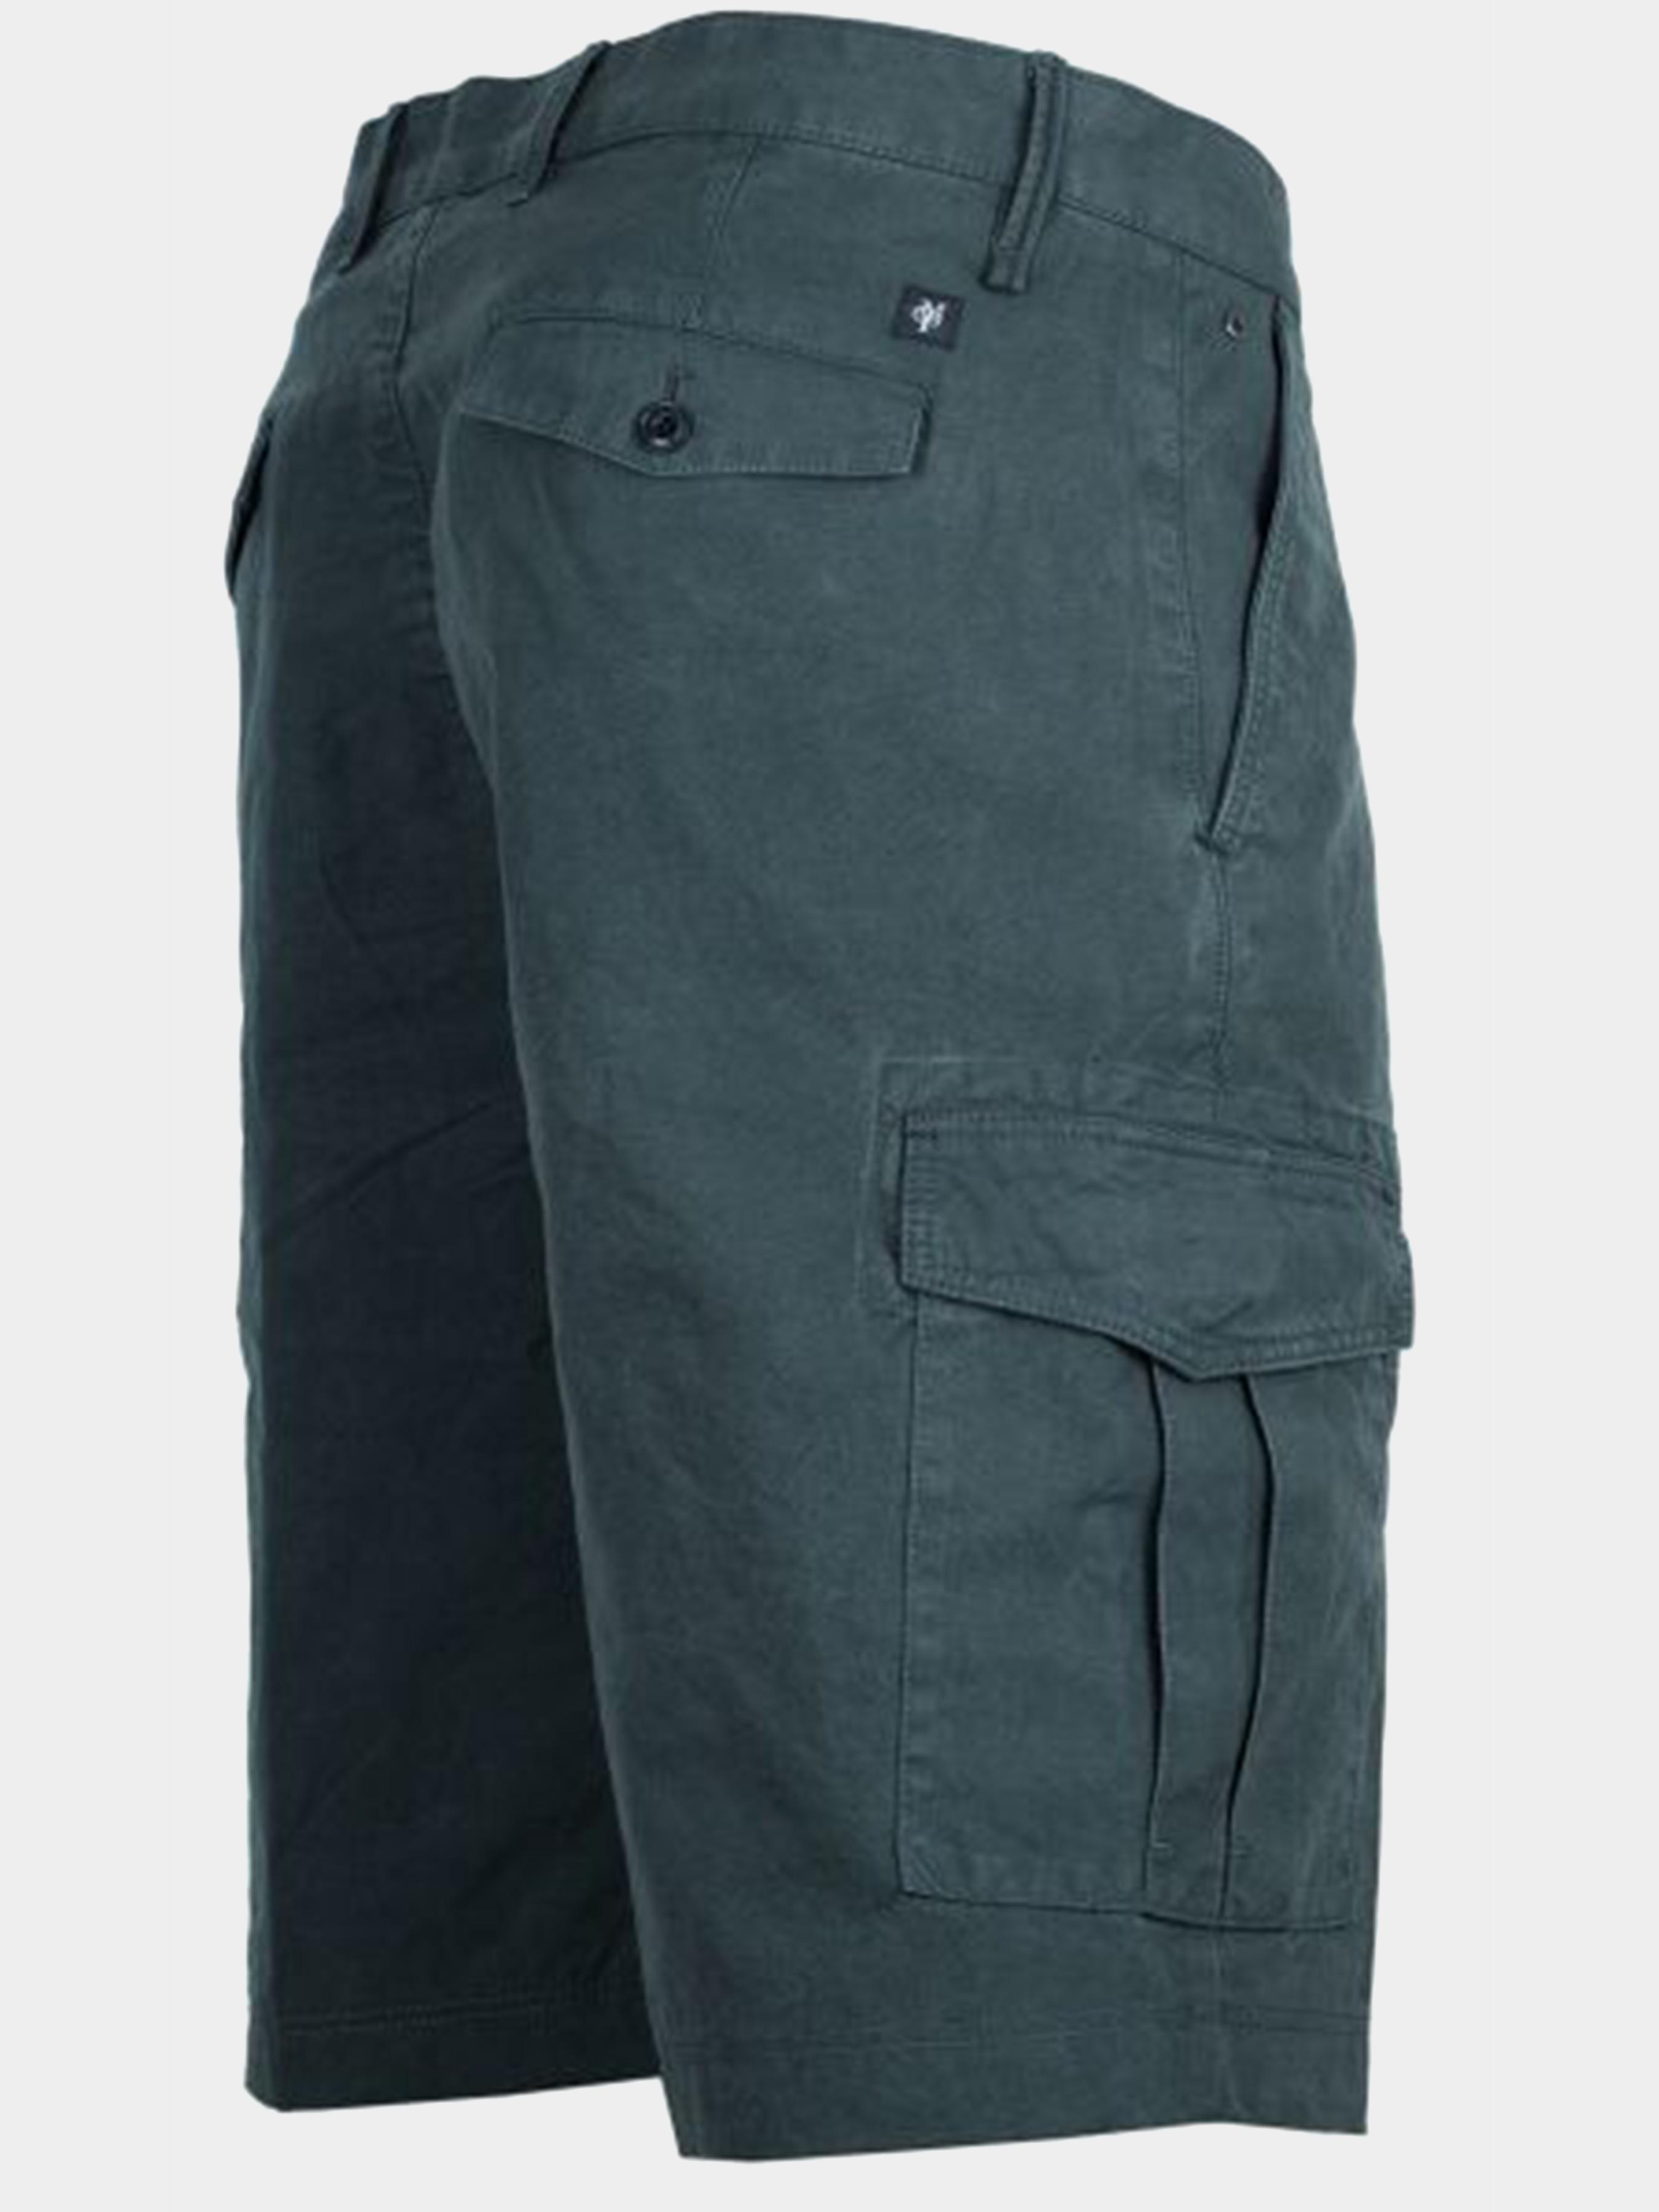 Шорты мужские MARC O'POLO модель 824008715058-451 , 2017